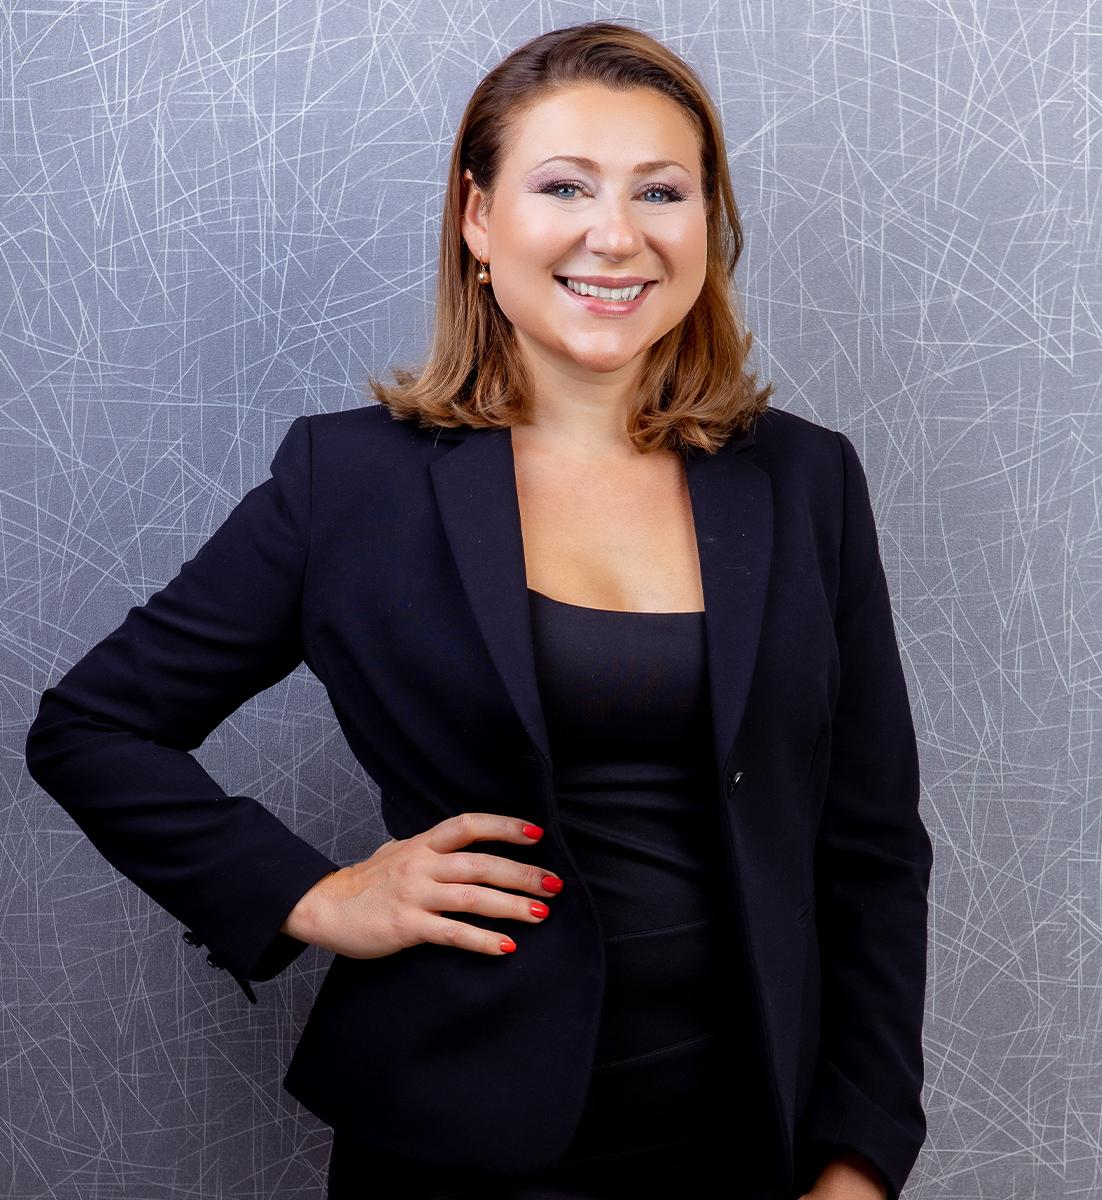 Natalie Nikolayeva